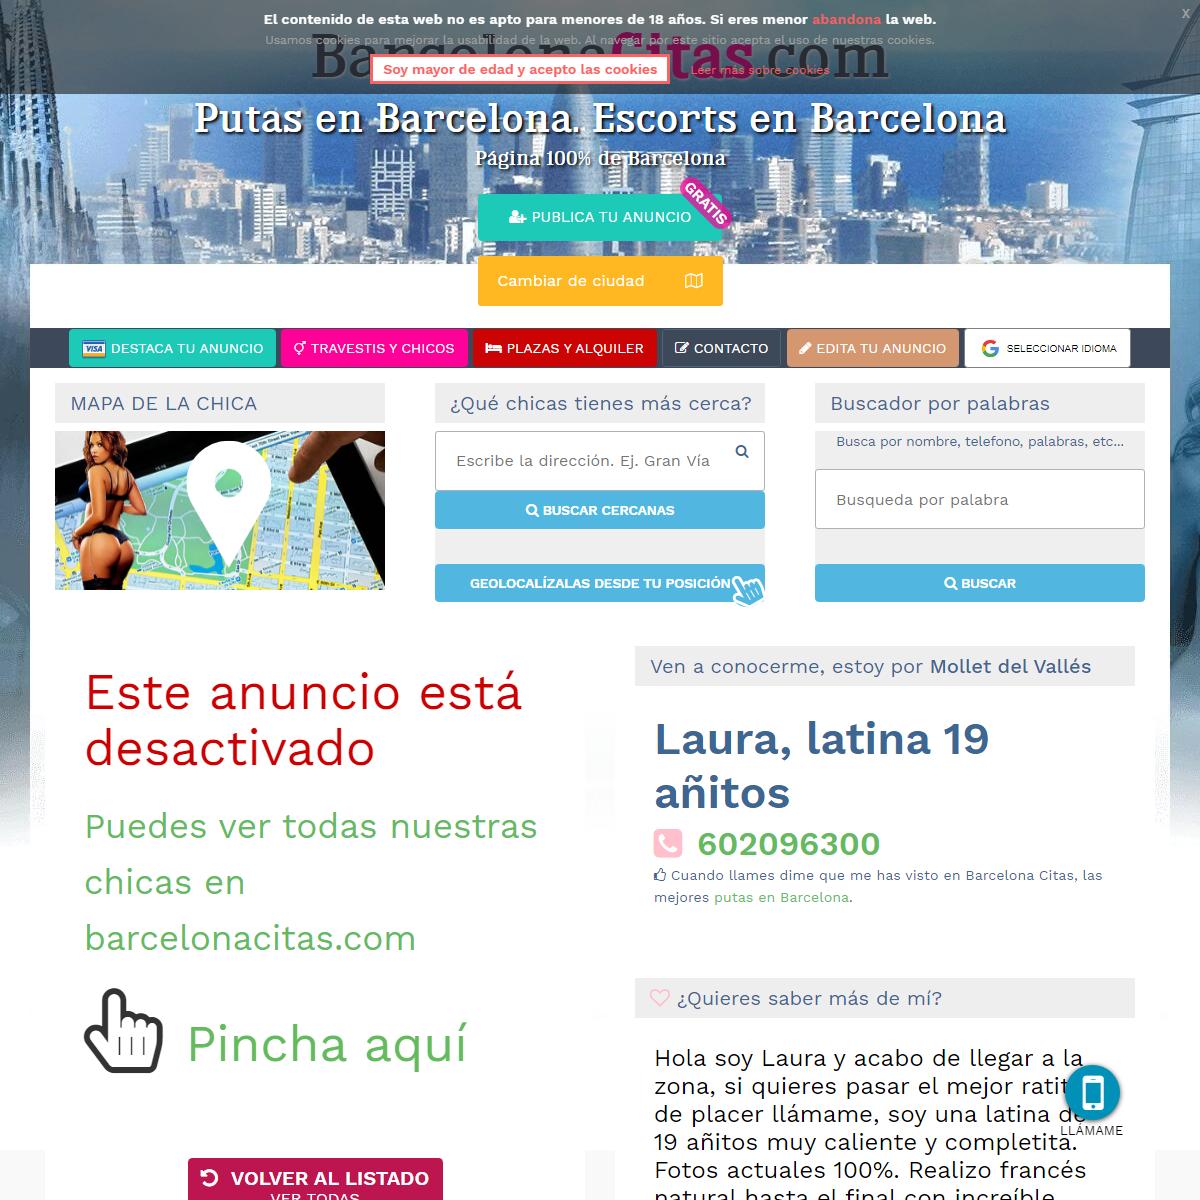 Laura, latina 19 añitos - tel- 602096300 - Putas Barcelona citas